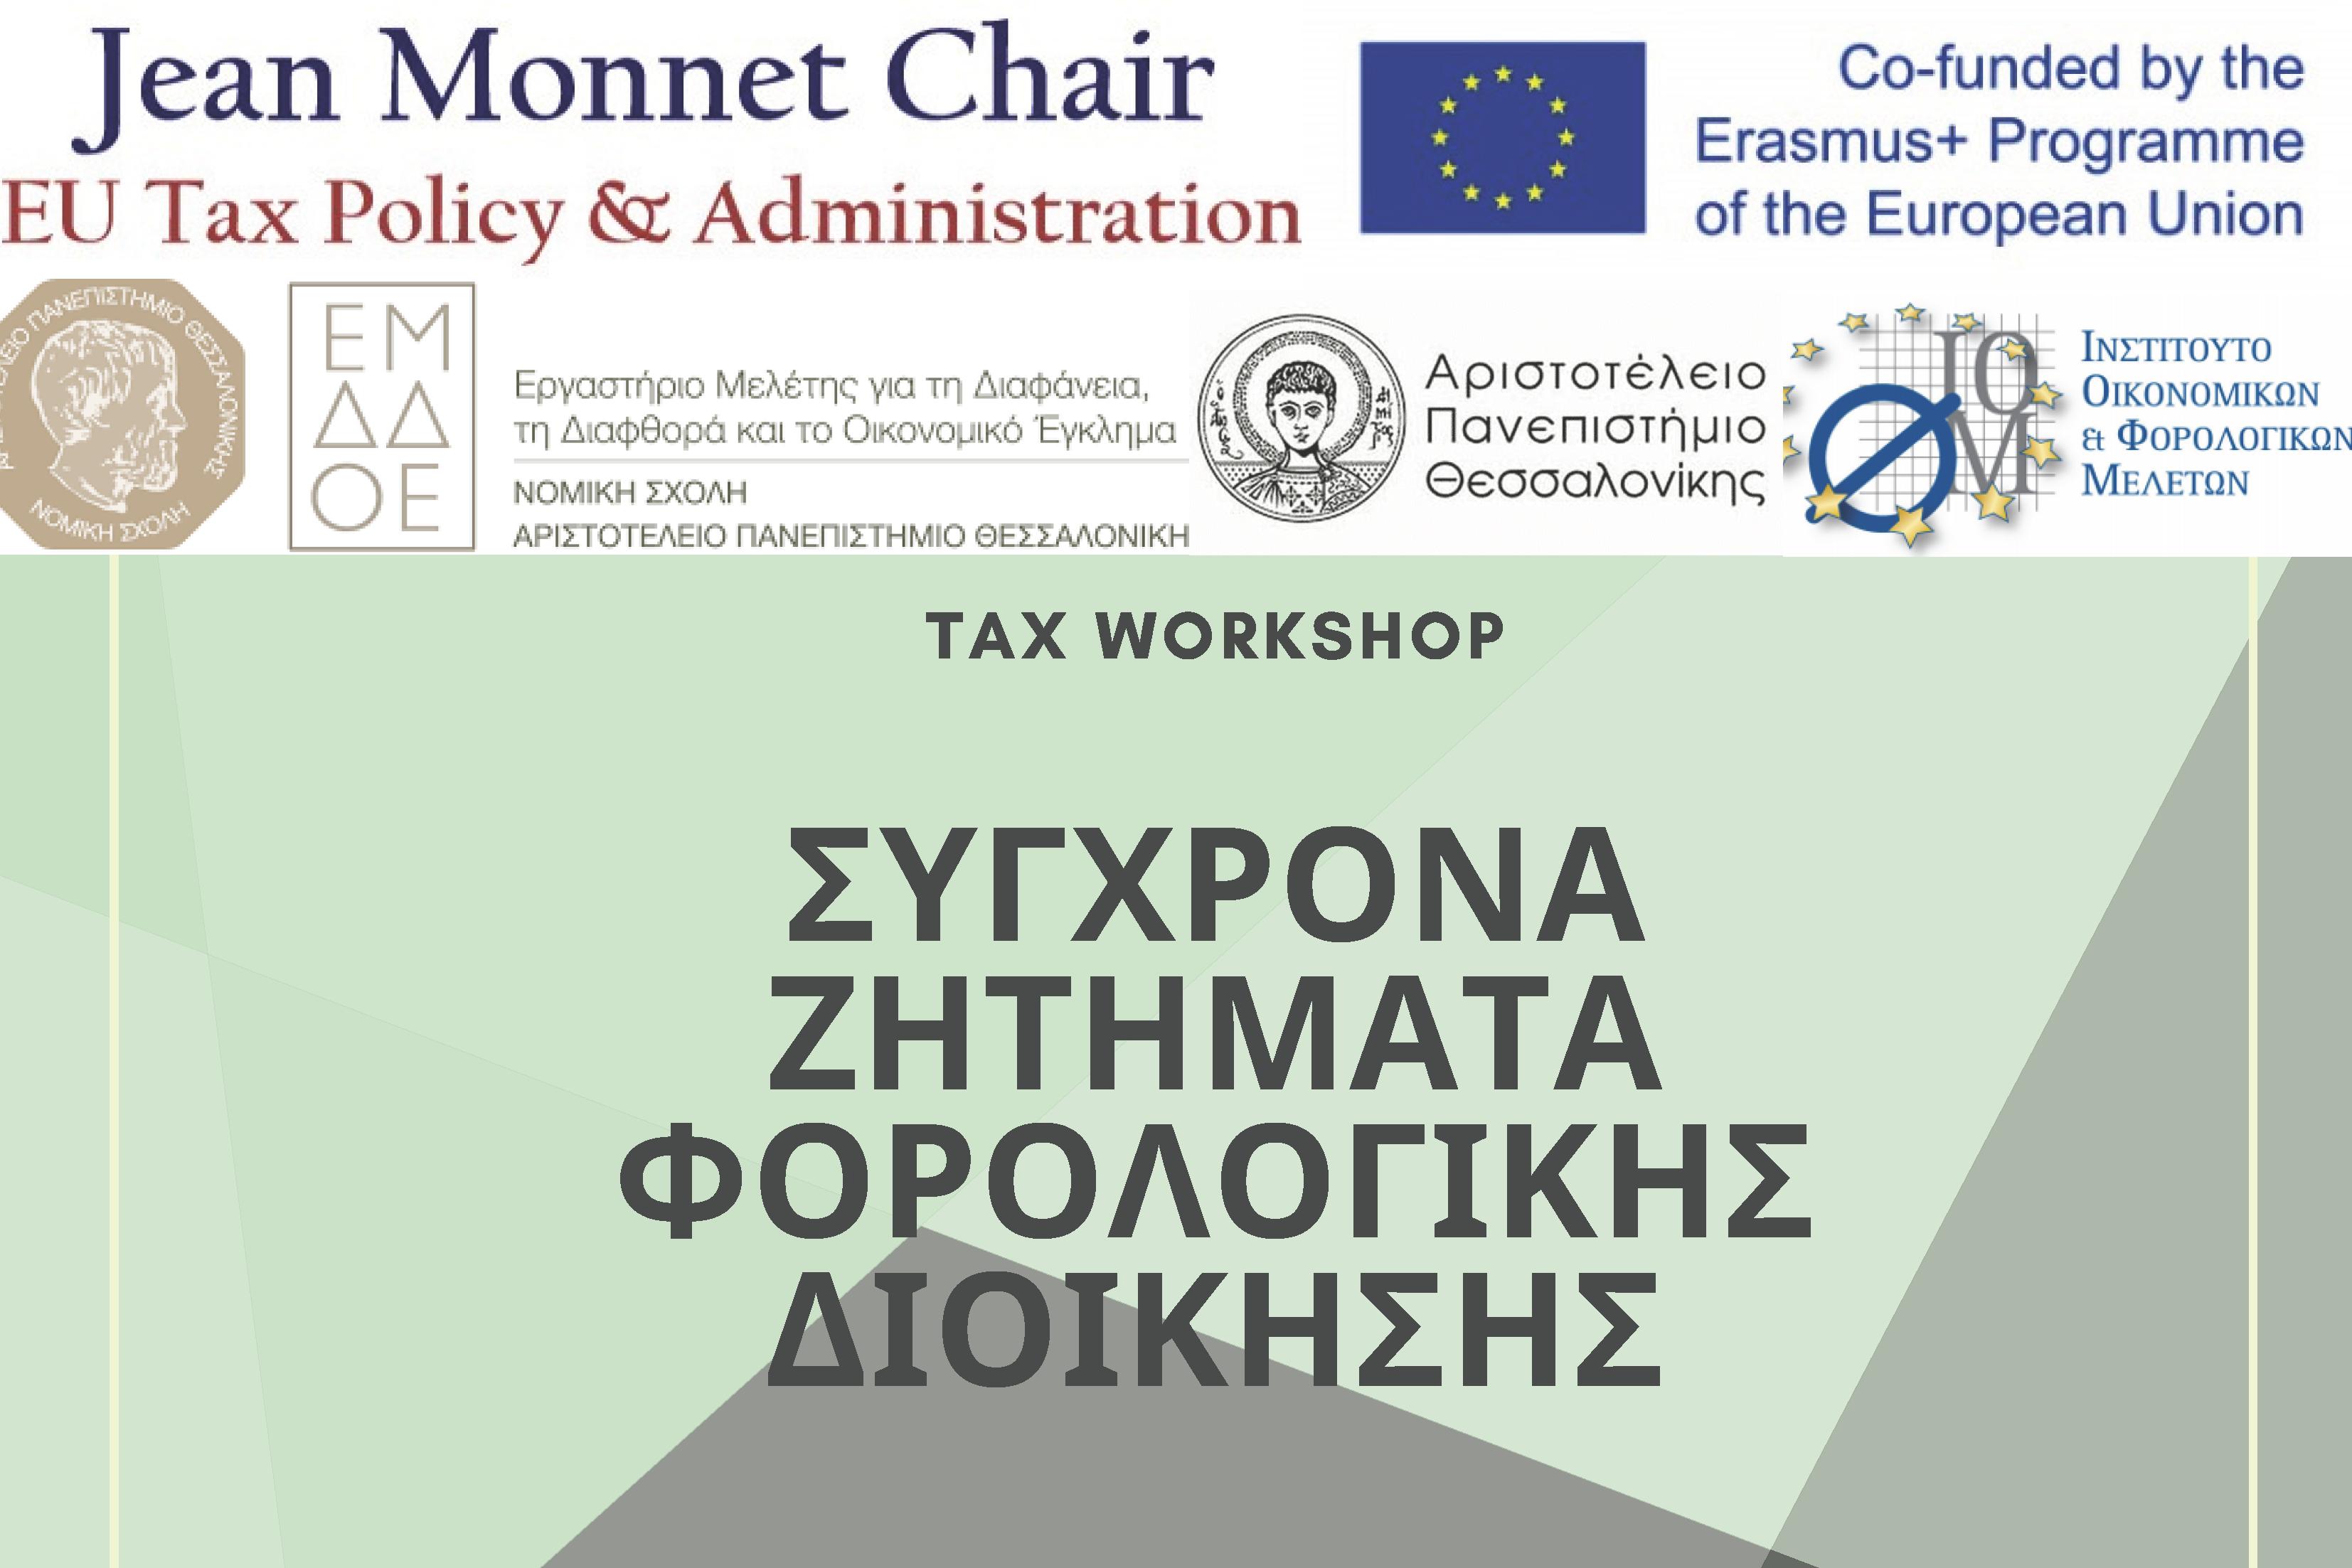 "Tax Webinar με θέμα ""Σύγχρονα Ζητήματα Φορολογικής Διοίκησης"". 8-9.6.2021"